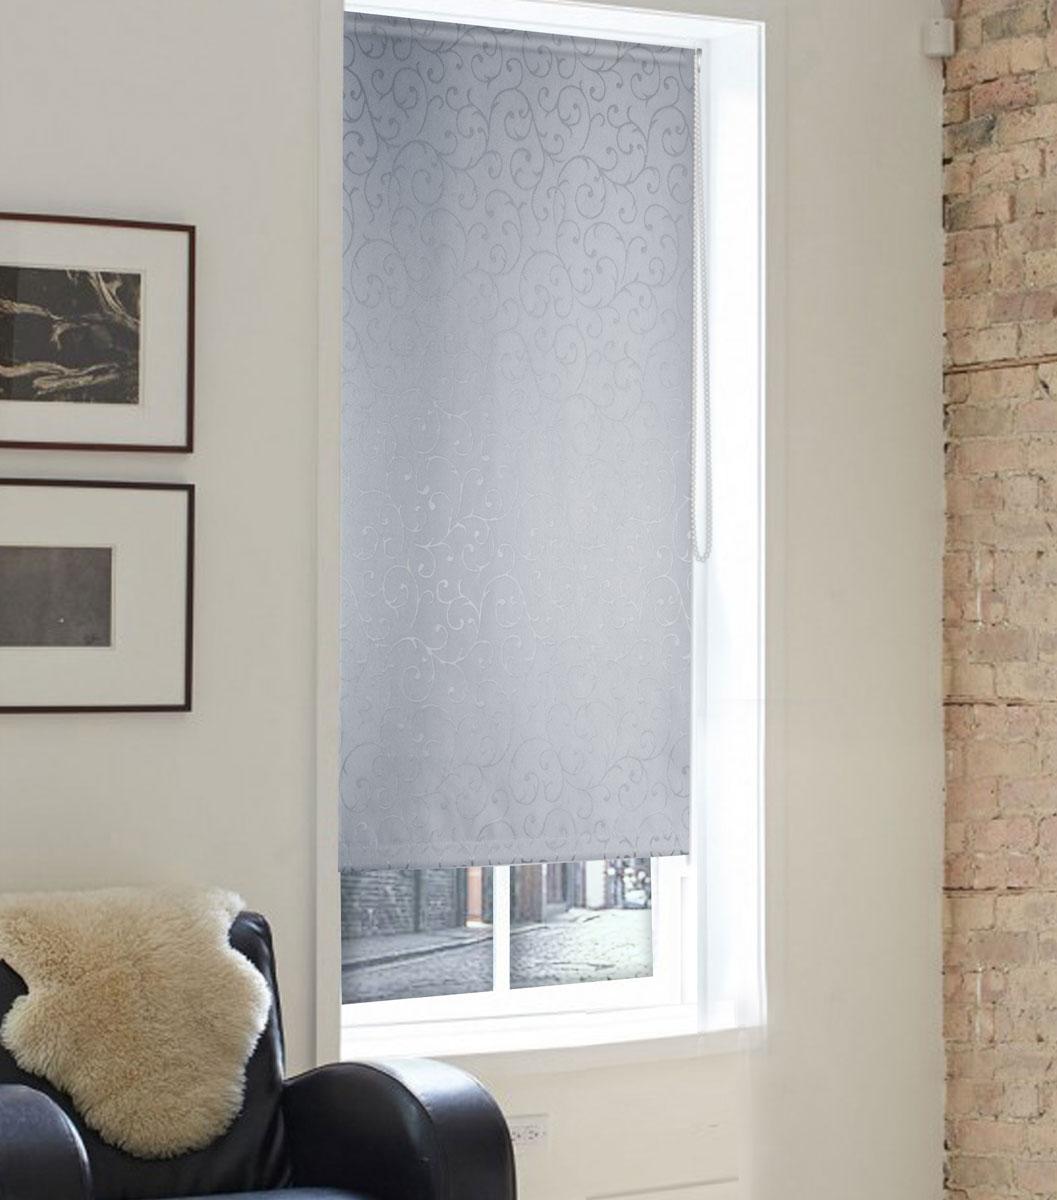 Штора рулонная Эскар Миниролло. Агат, цвет: серый, ширина 83 см, высота 160 см штора рулонная эскар миниролло агат цвет серый ширина 73 см высота 160 см